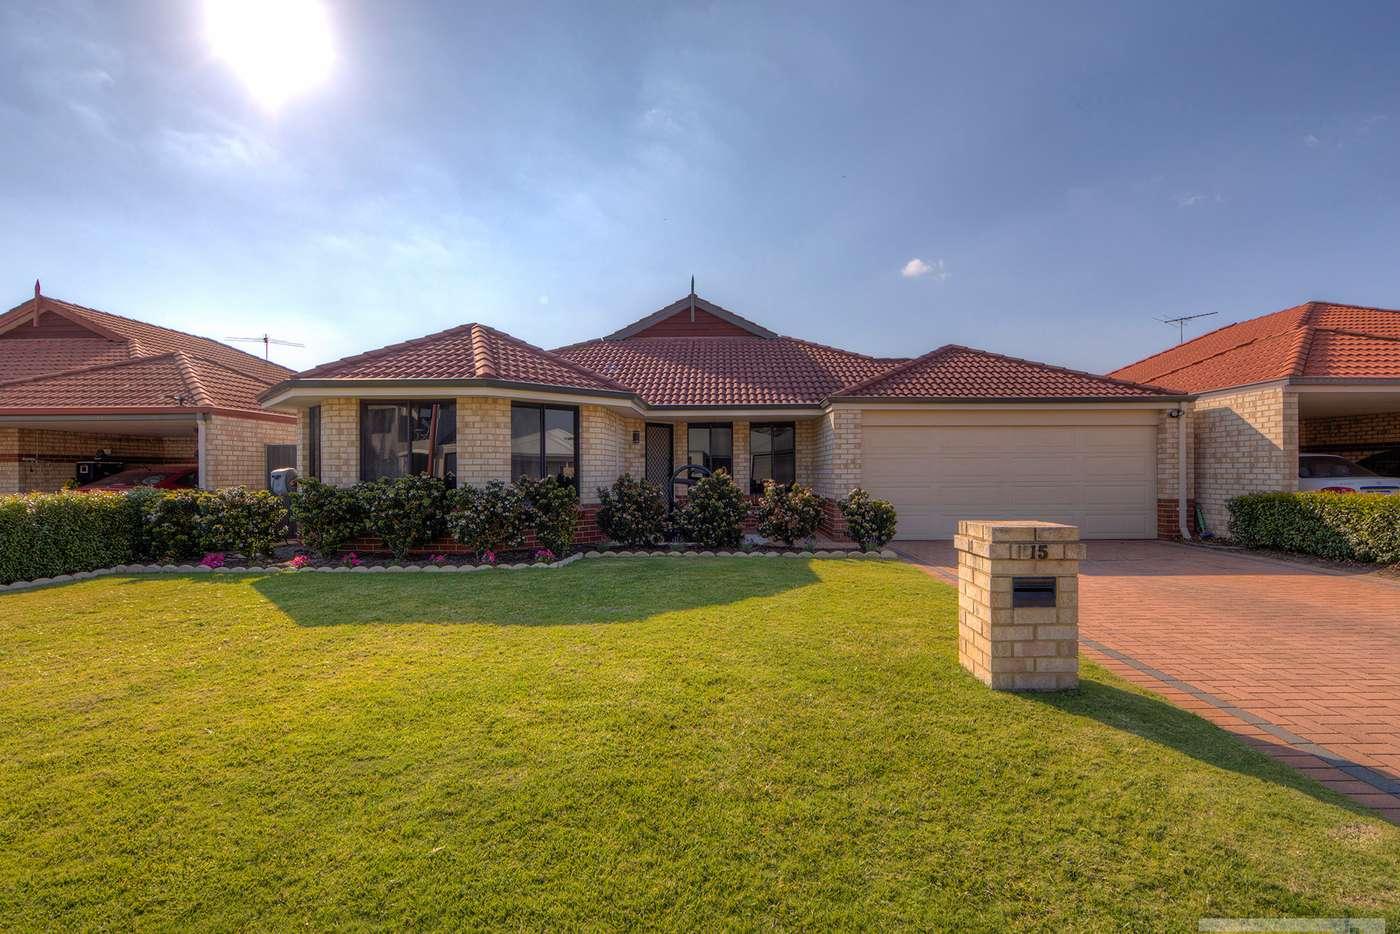 Main view of Homely house listing, 15 Quokka Street, Wattle Grove WA 6107